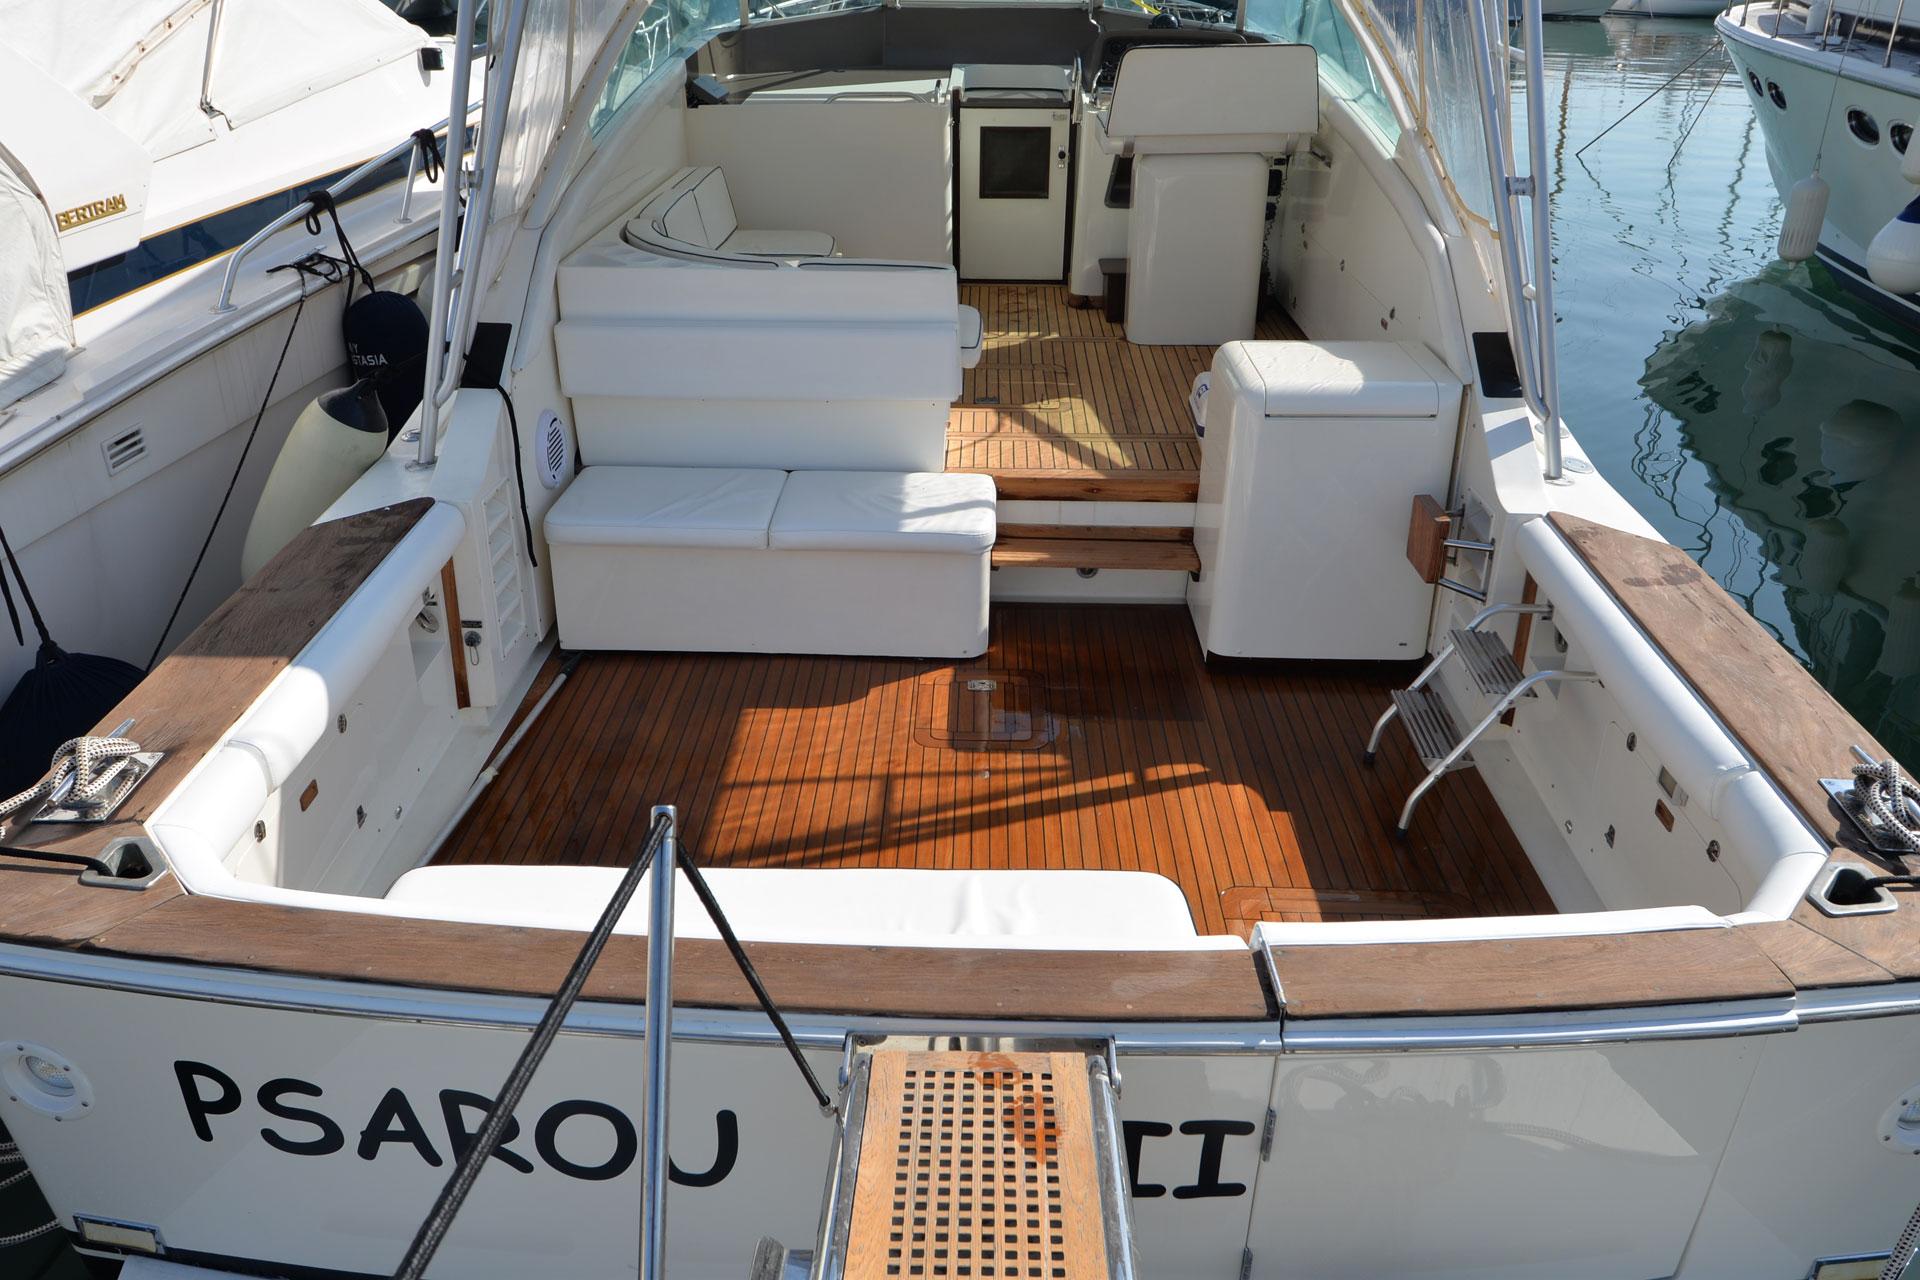 Santo-Maritime-Yachting-Bertram-Inside-Image7